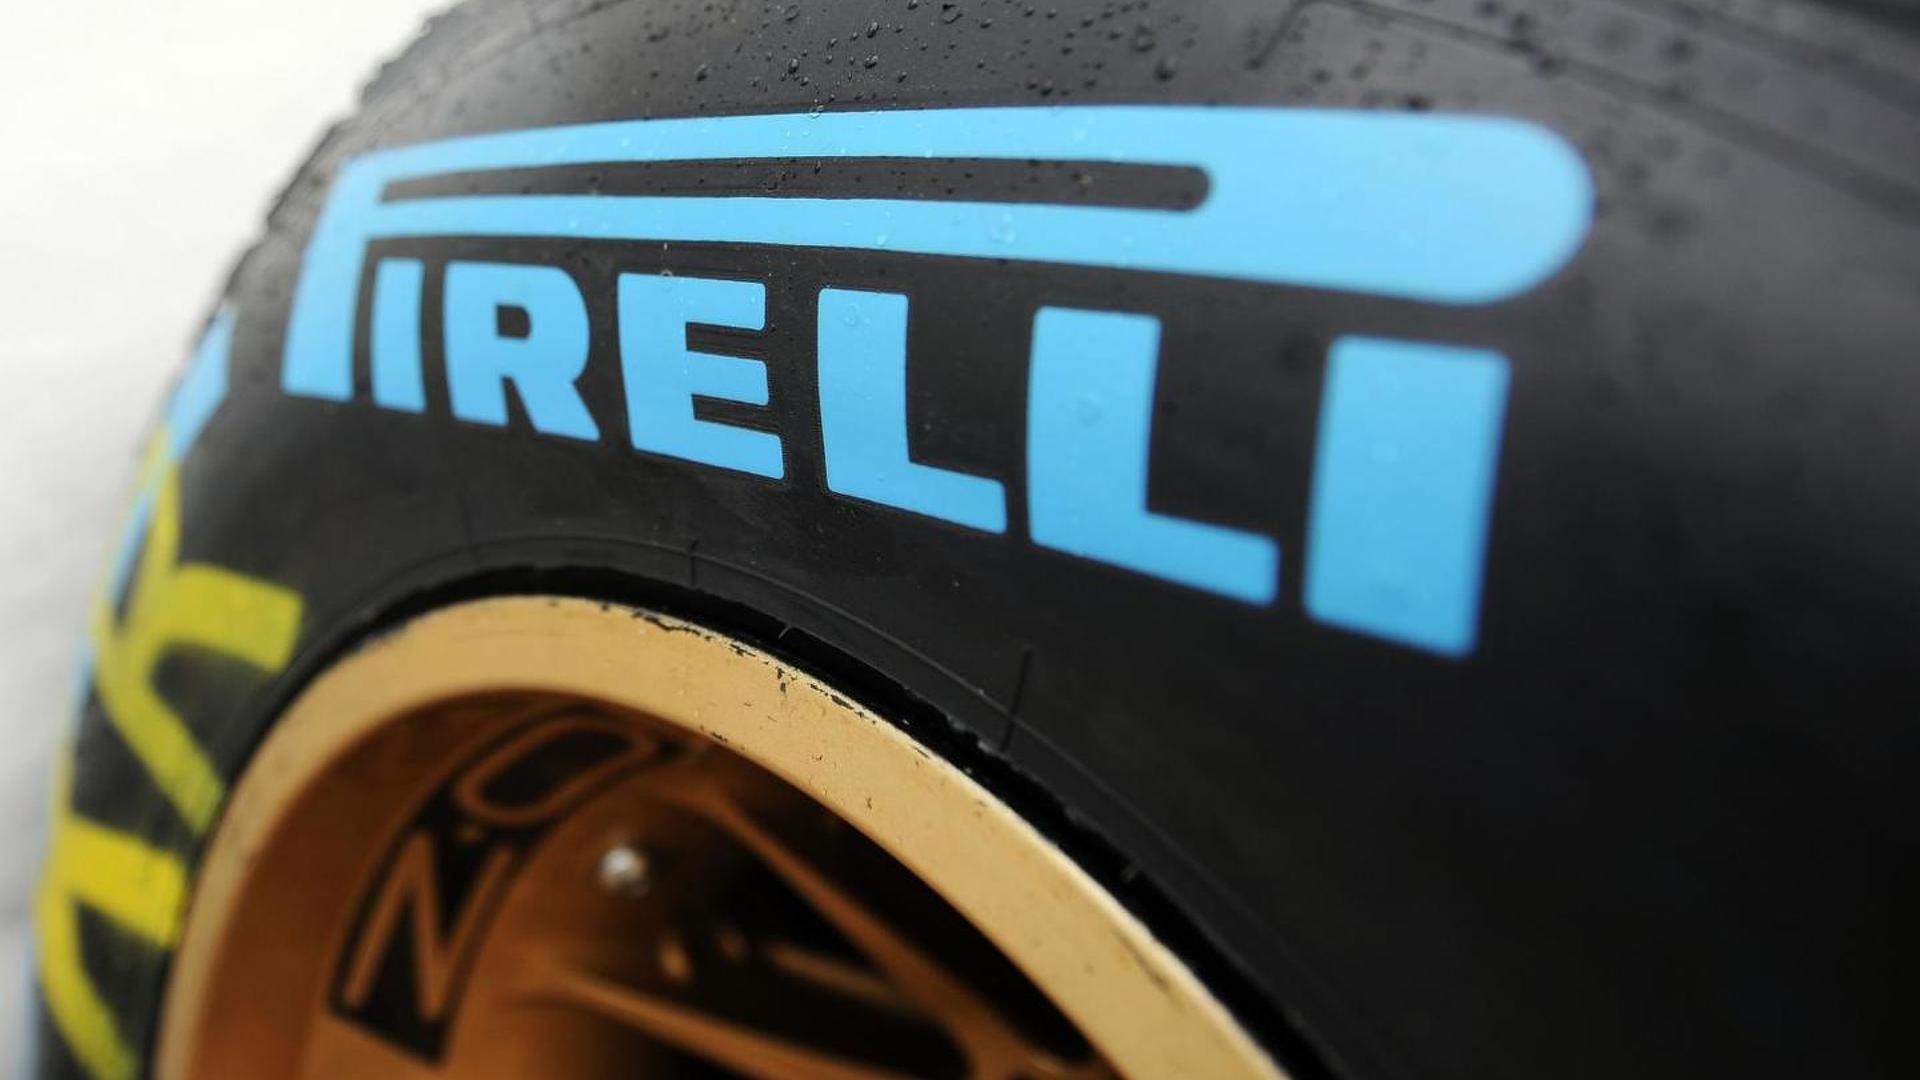 Pirelli drops 'conservative' Hungary compound choice